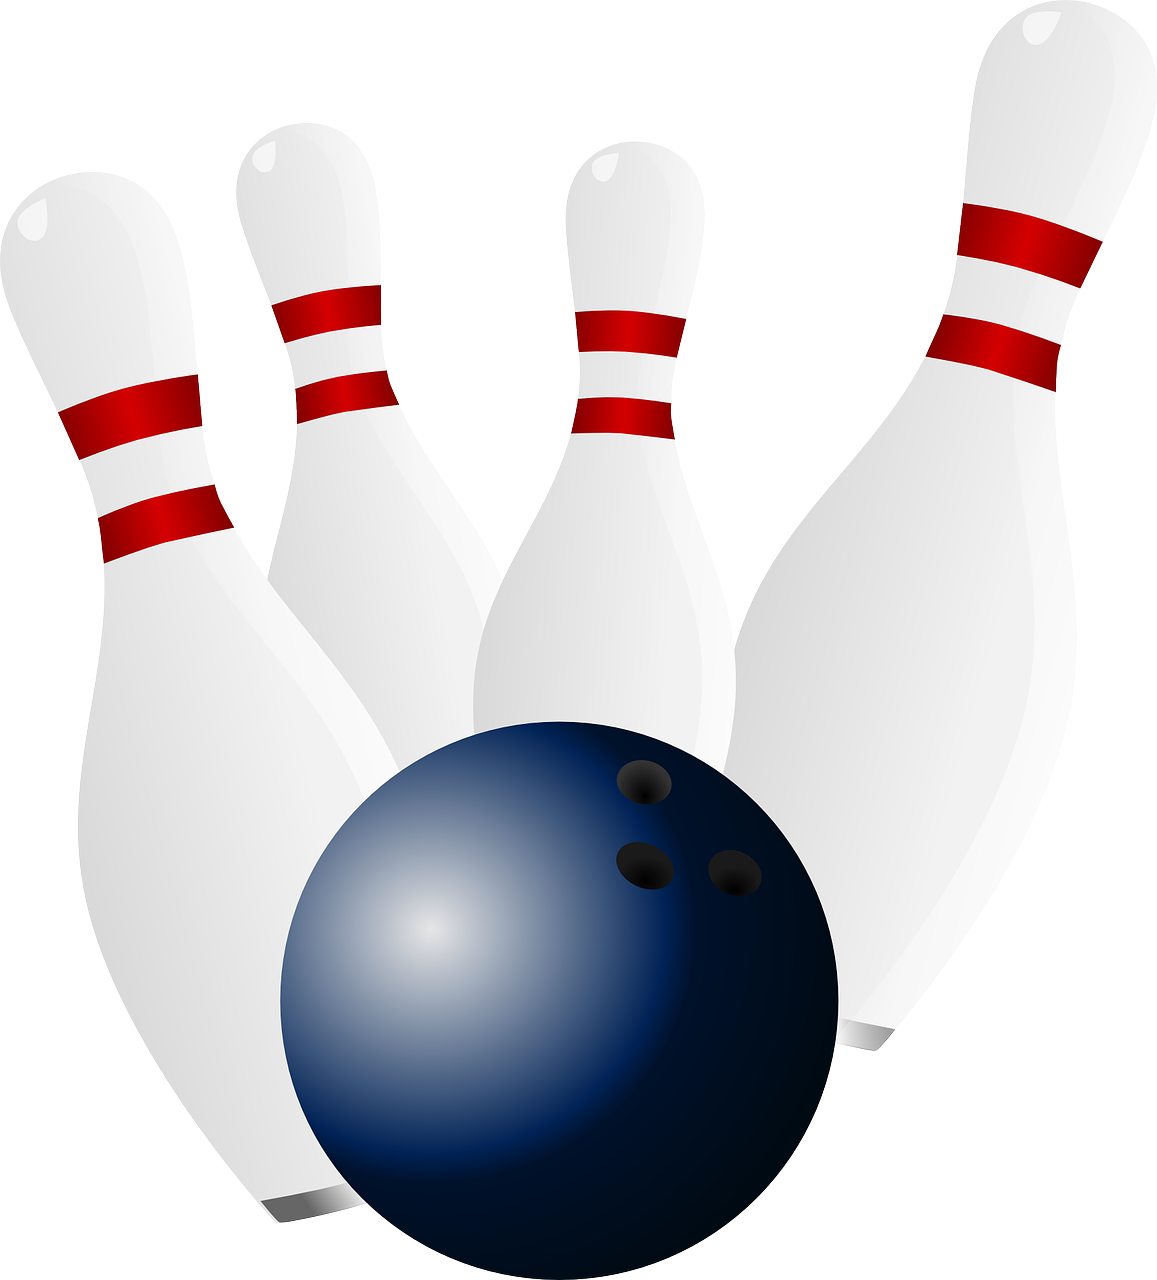 Ausflug zum Bowling am 06.01.2016